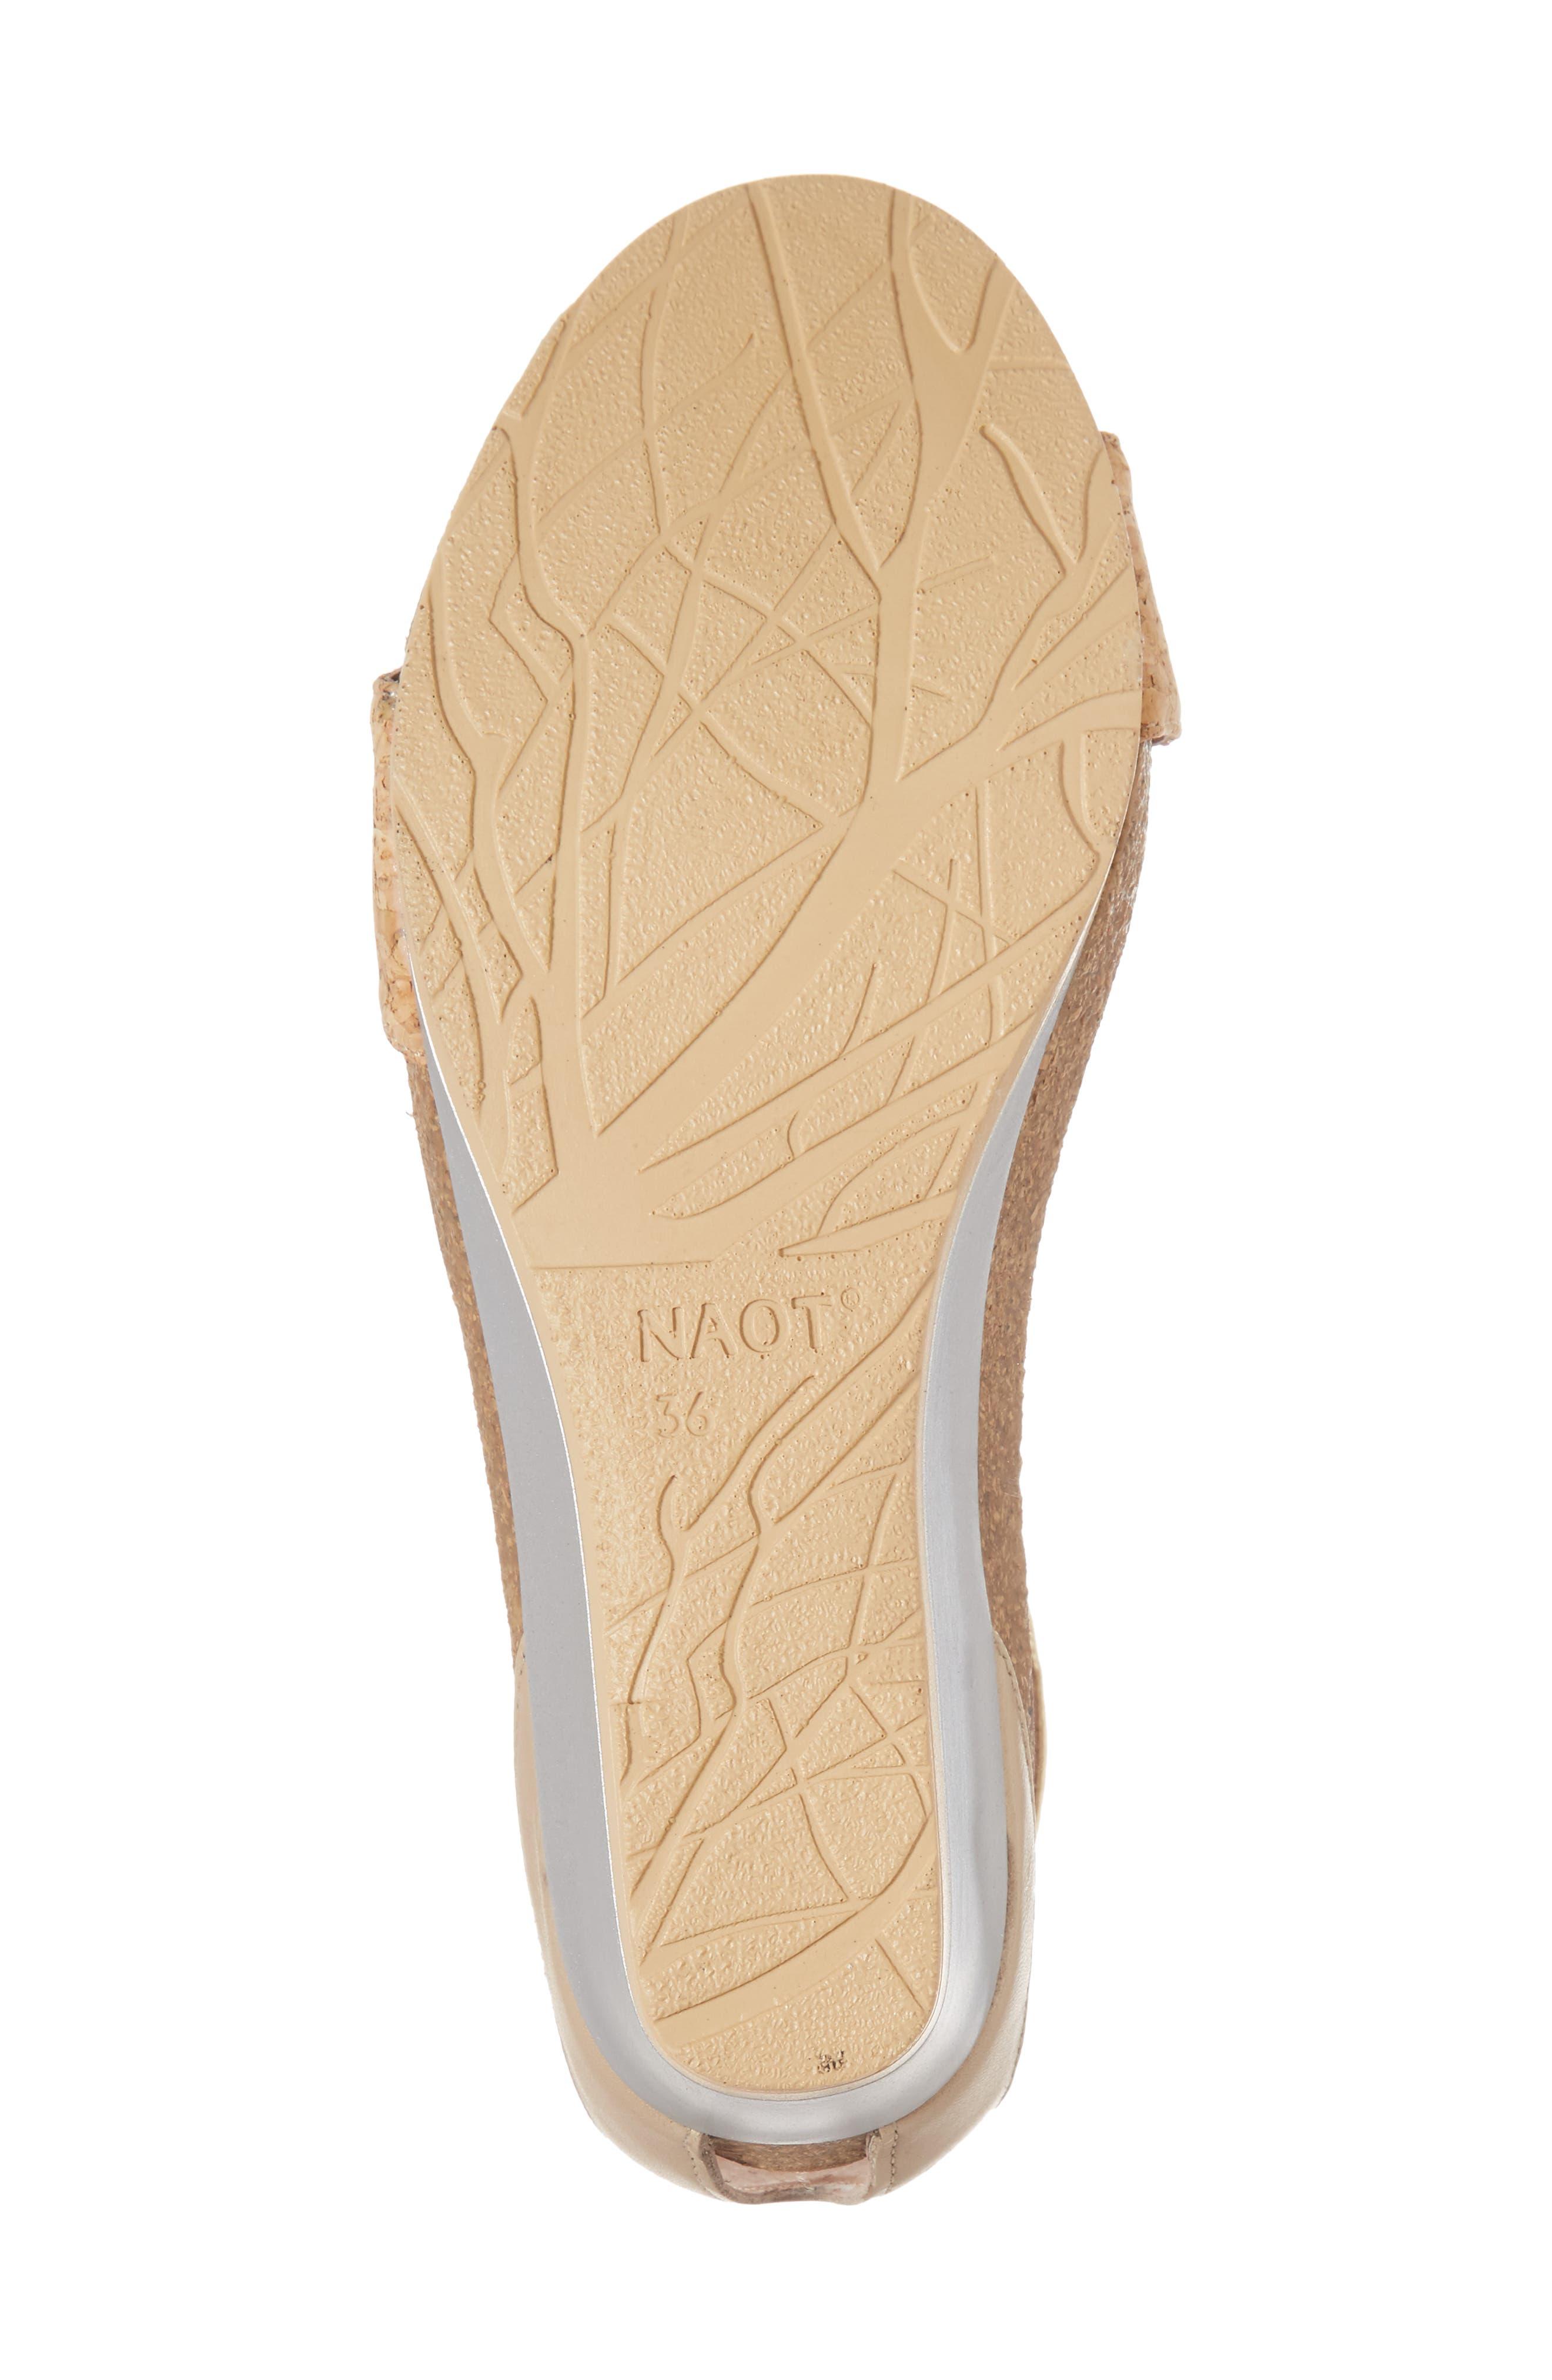 'Pixie' Sandal,                             Alternate thumbnail 6, color,                             Cork Leather